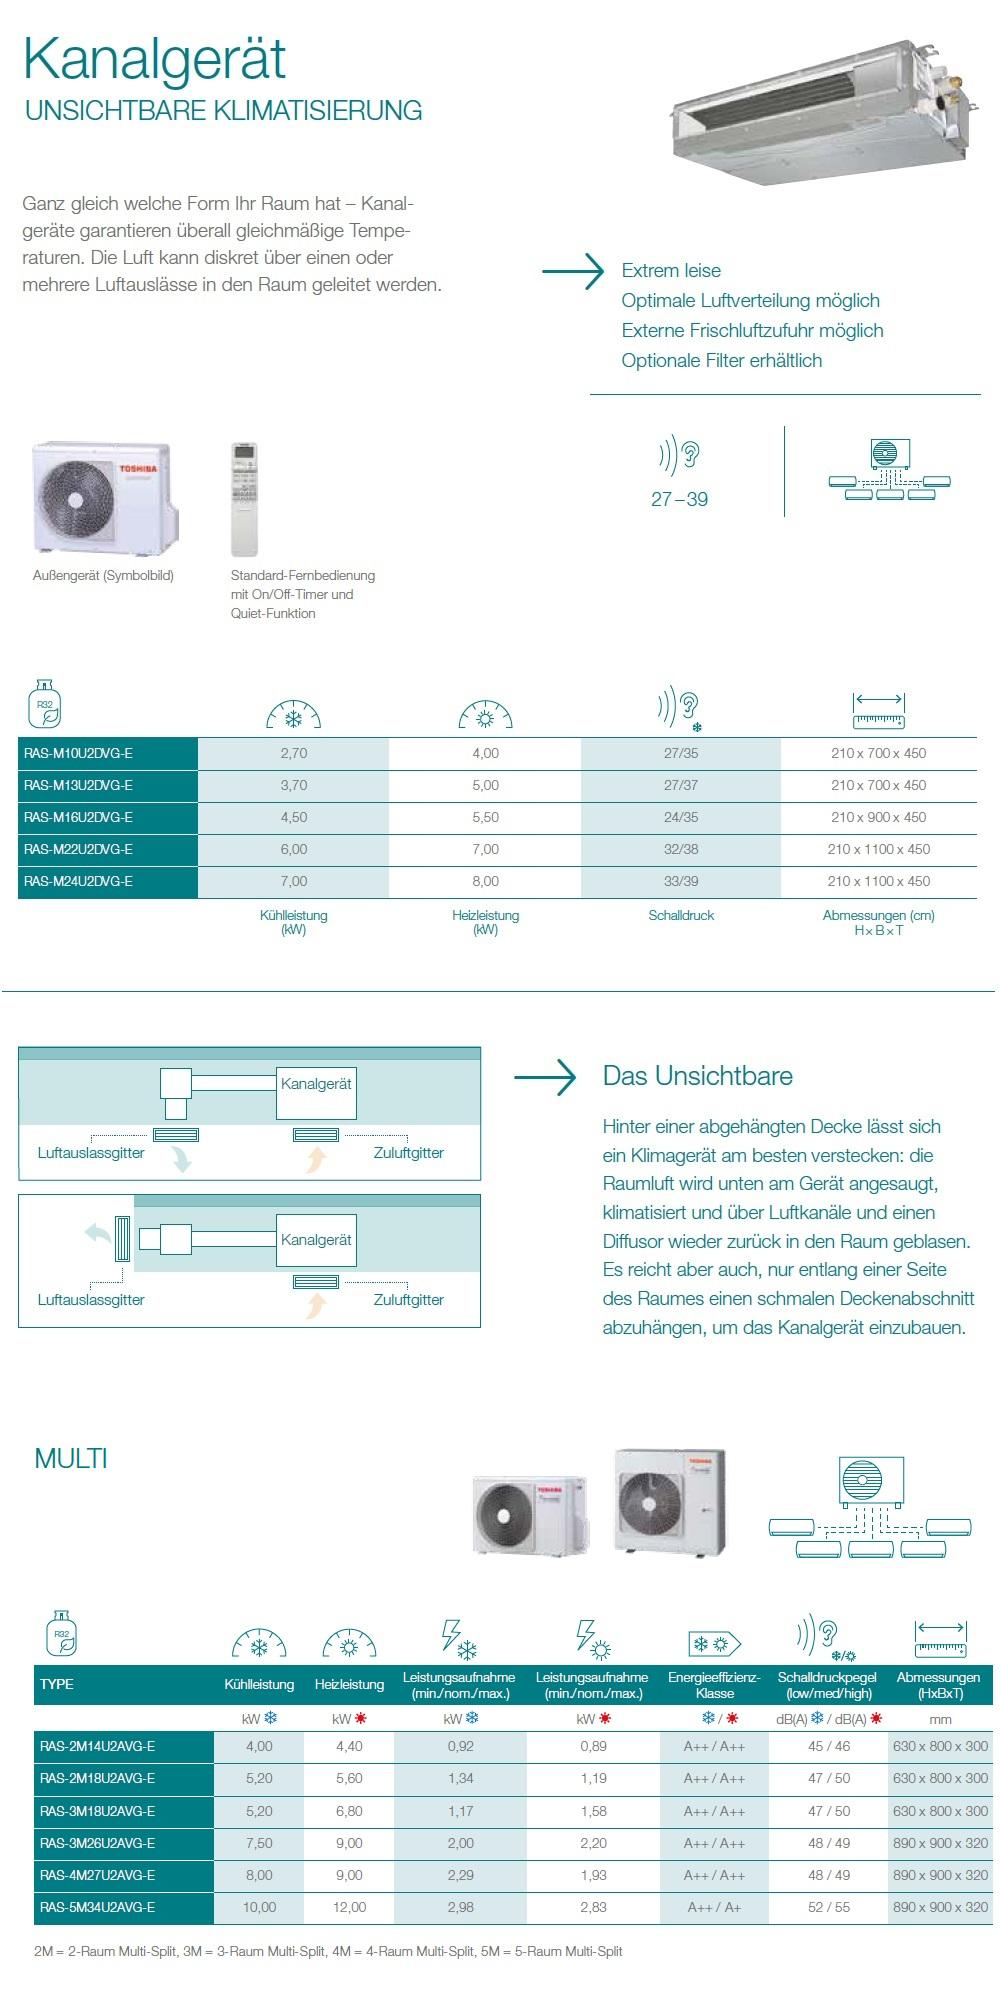 Klimaanlagen Toshiba Trio Split 7+7+15 Kanal Slim RAS-3M18U2AVG-E